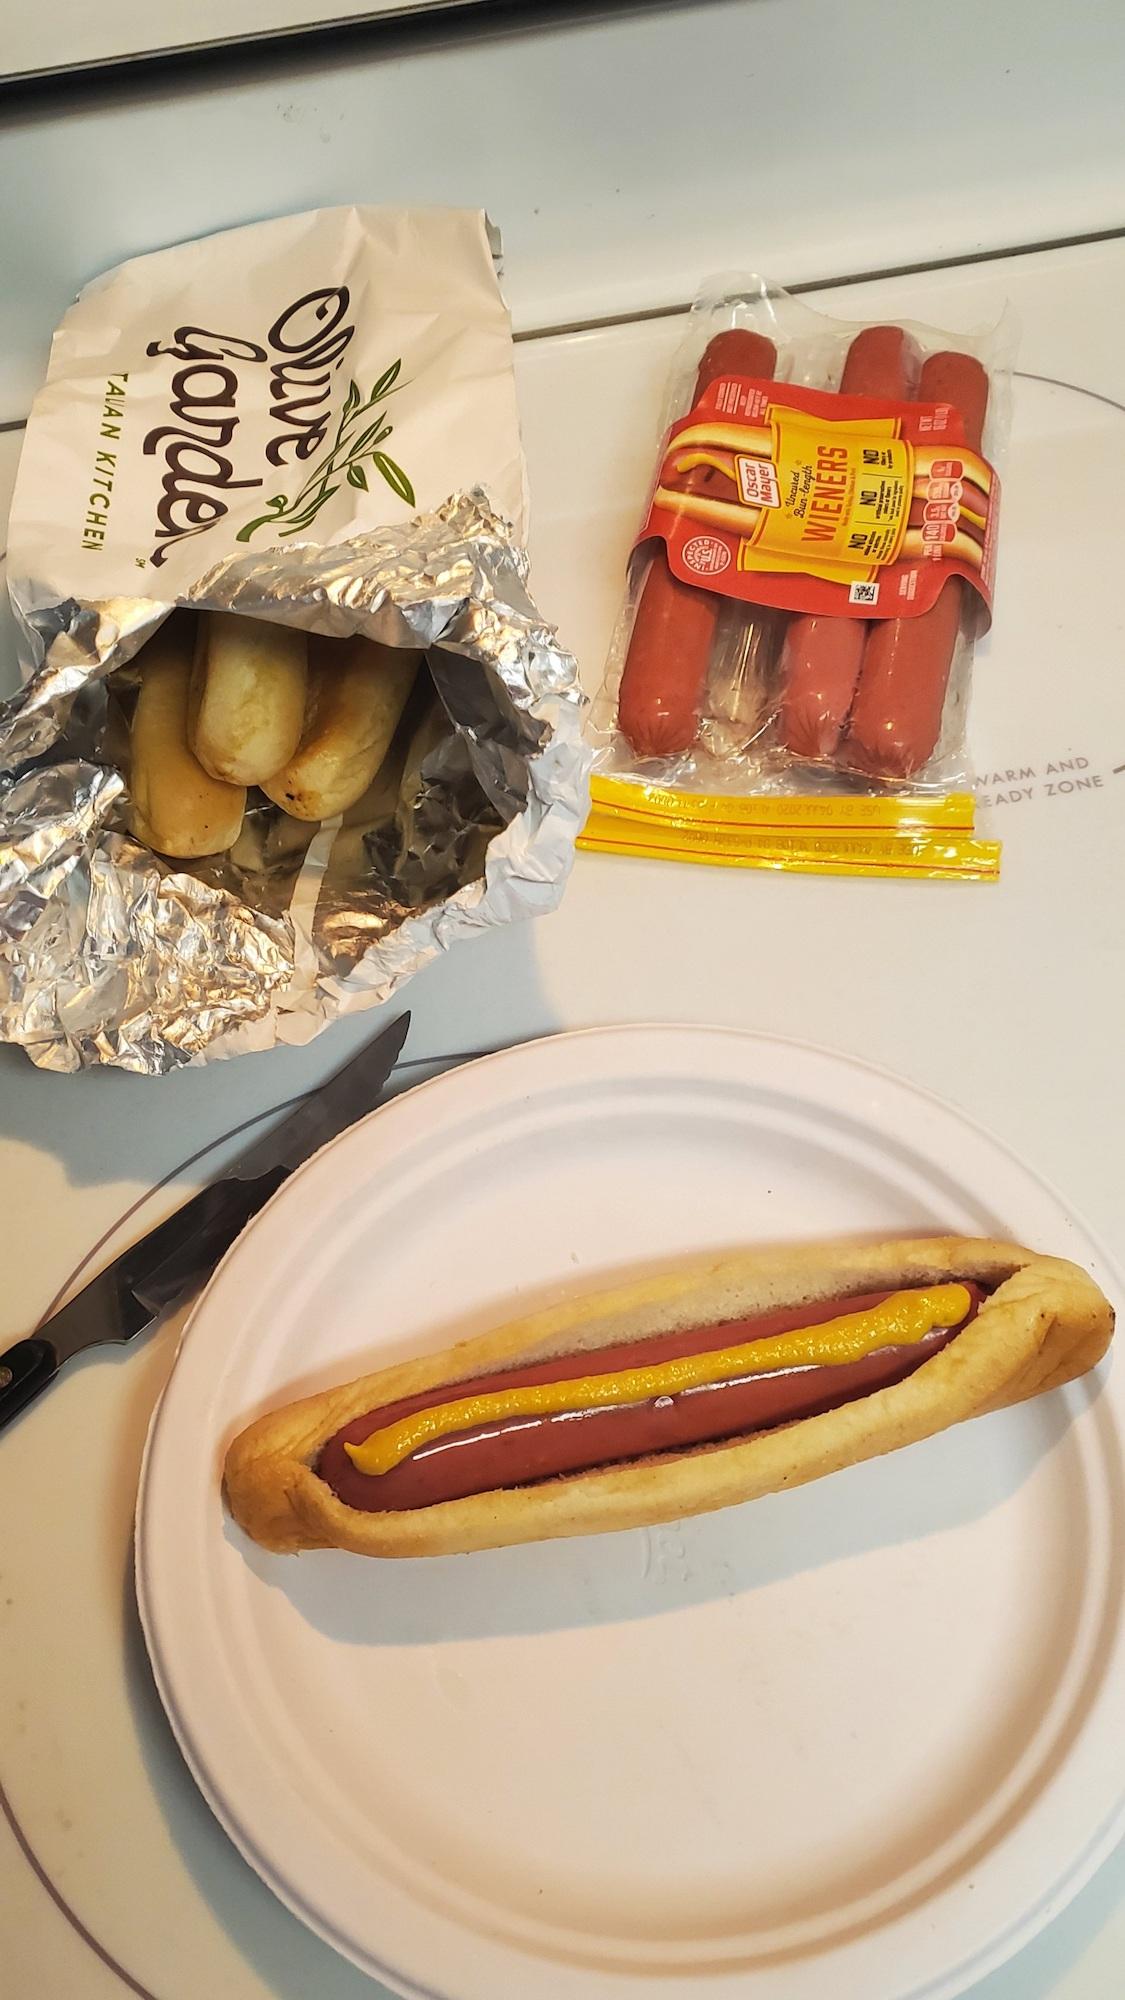 olive-garden-hot-dog